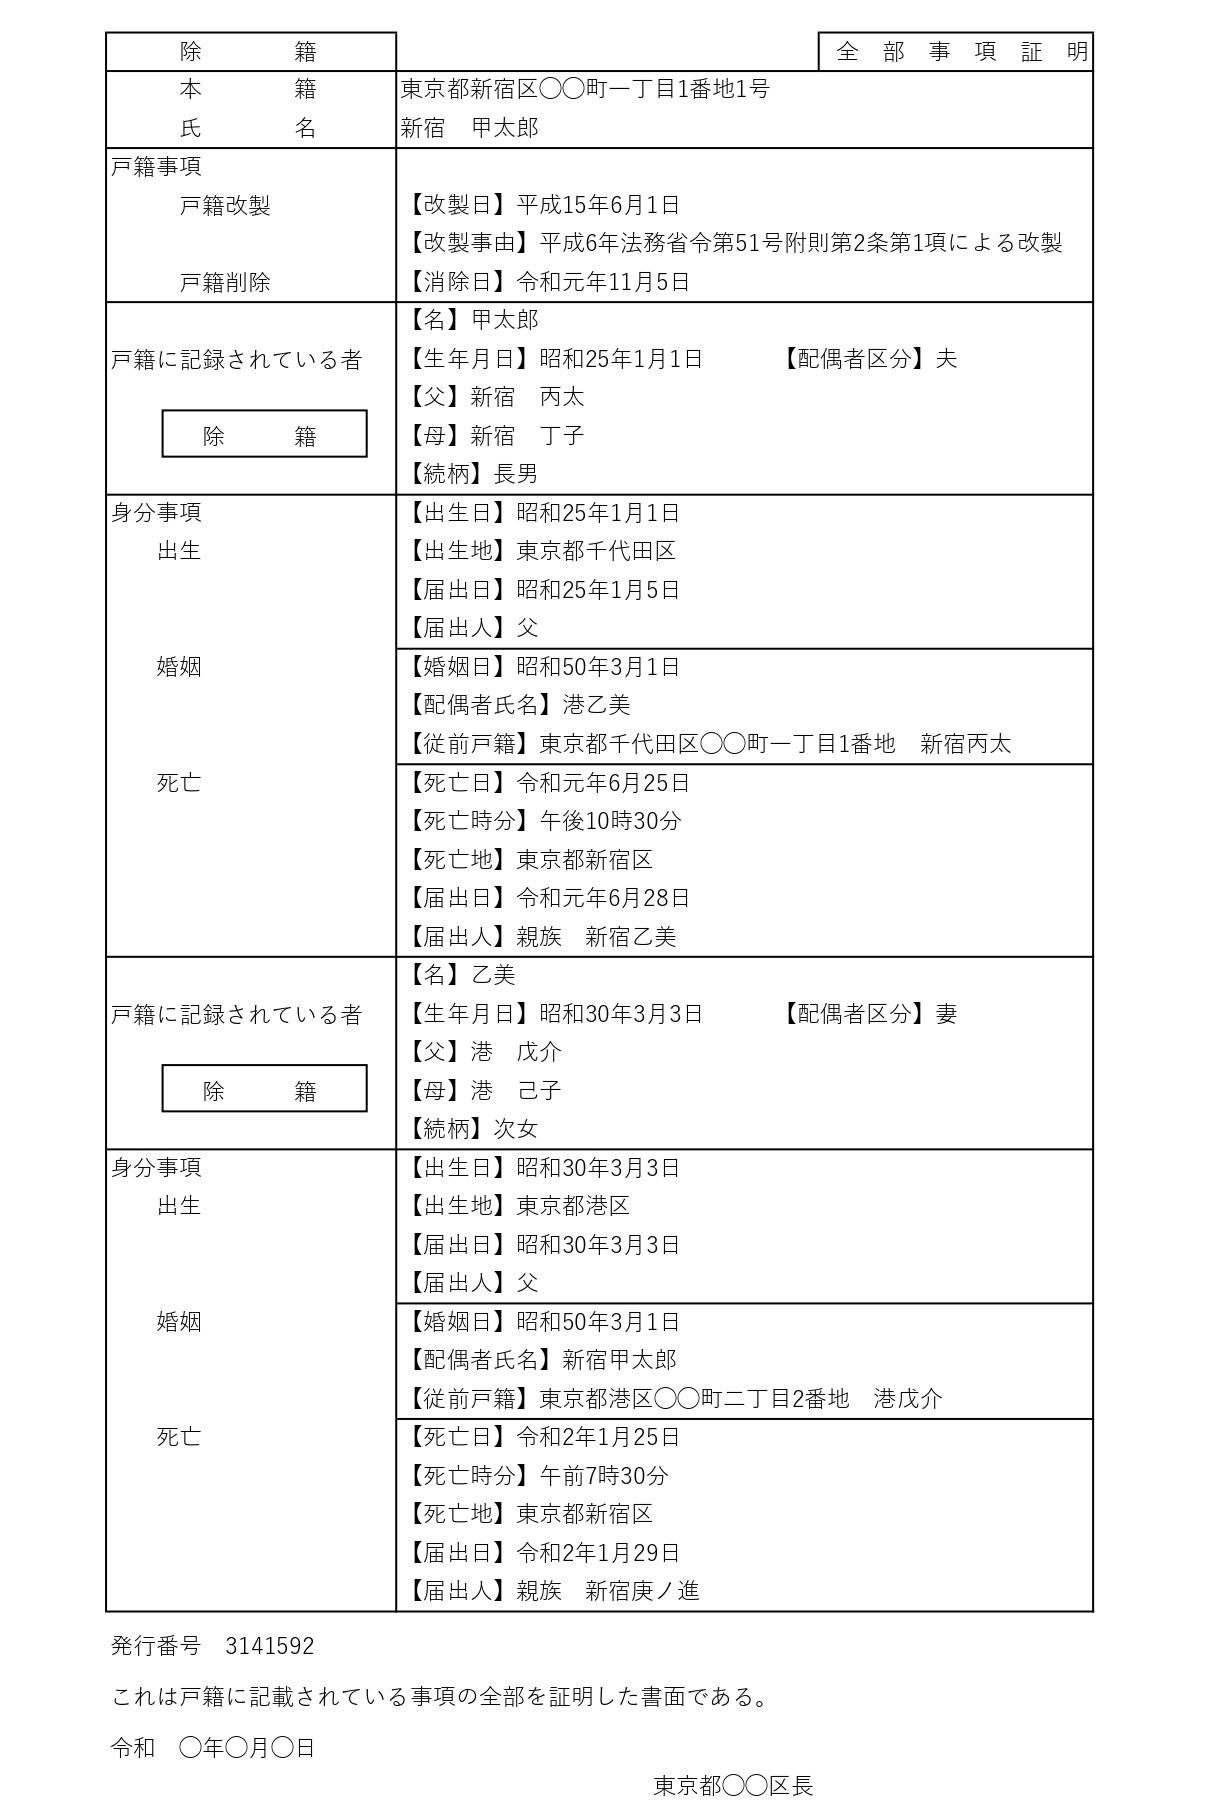 joseki-zenbujiko 除籍全部事項証明書